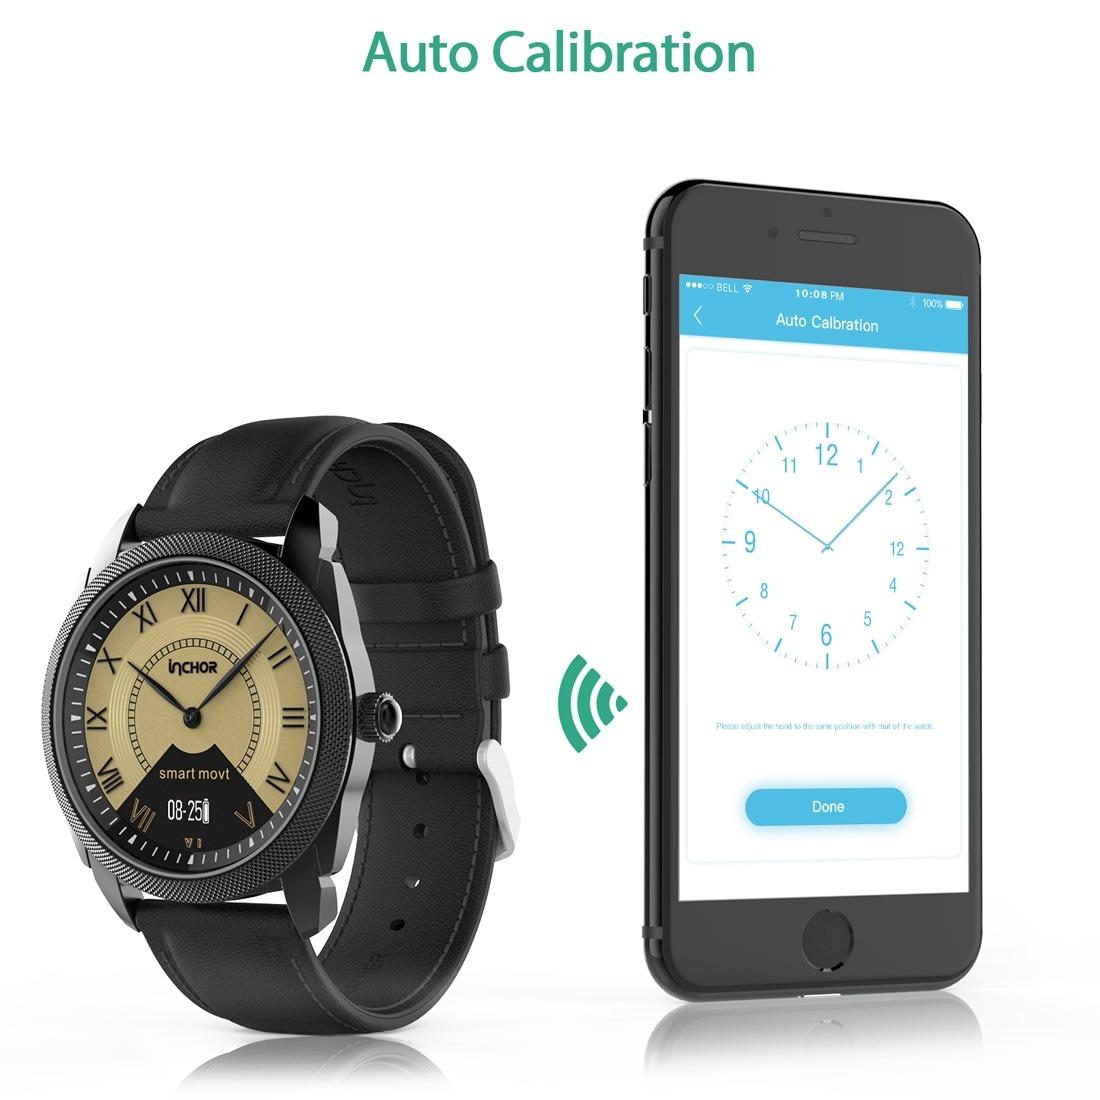 Inteligente Reloj Bluetooth Inchor Inclock Vida Impermeable lK1cTF3J